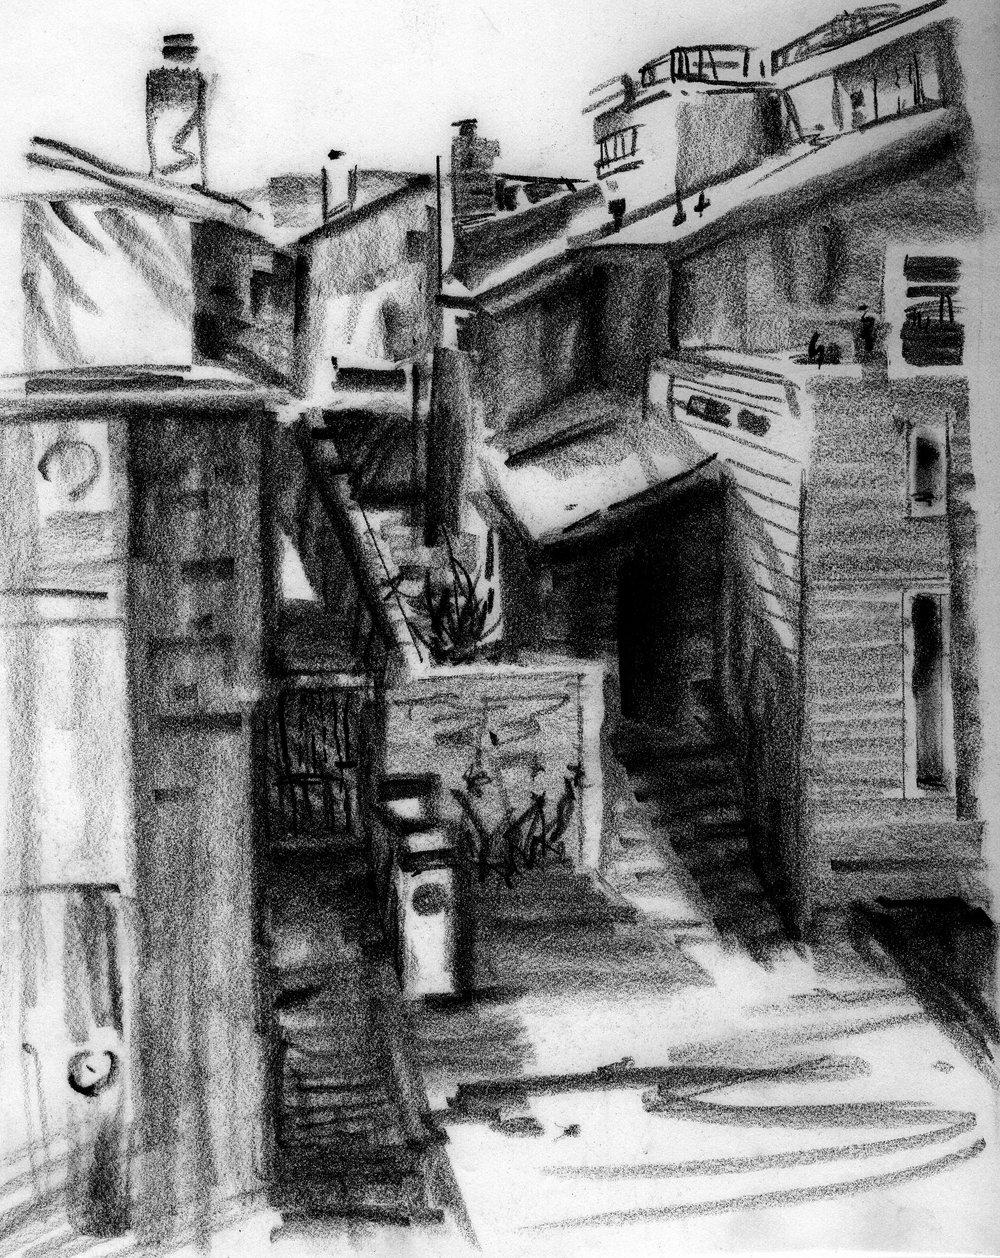 Back Alley in California